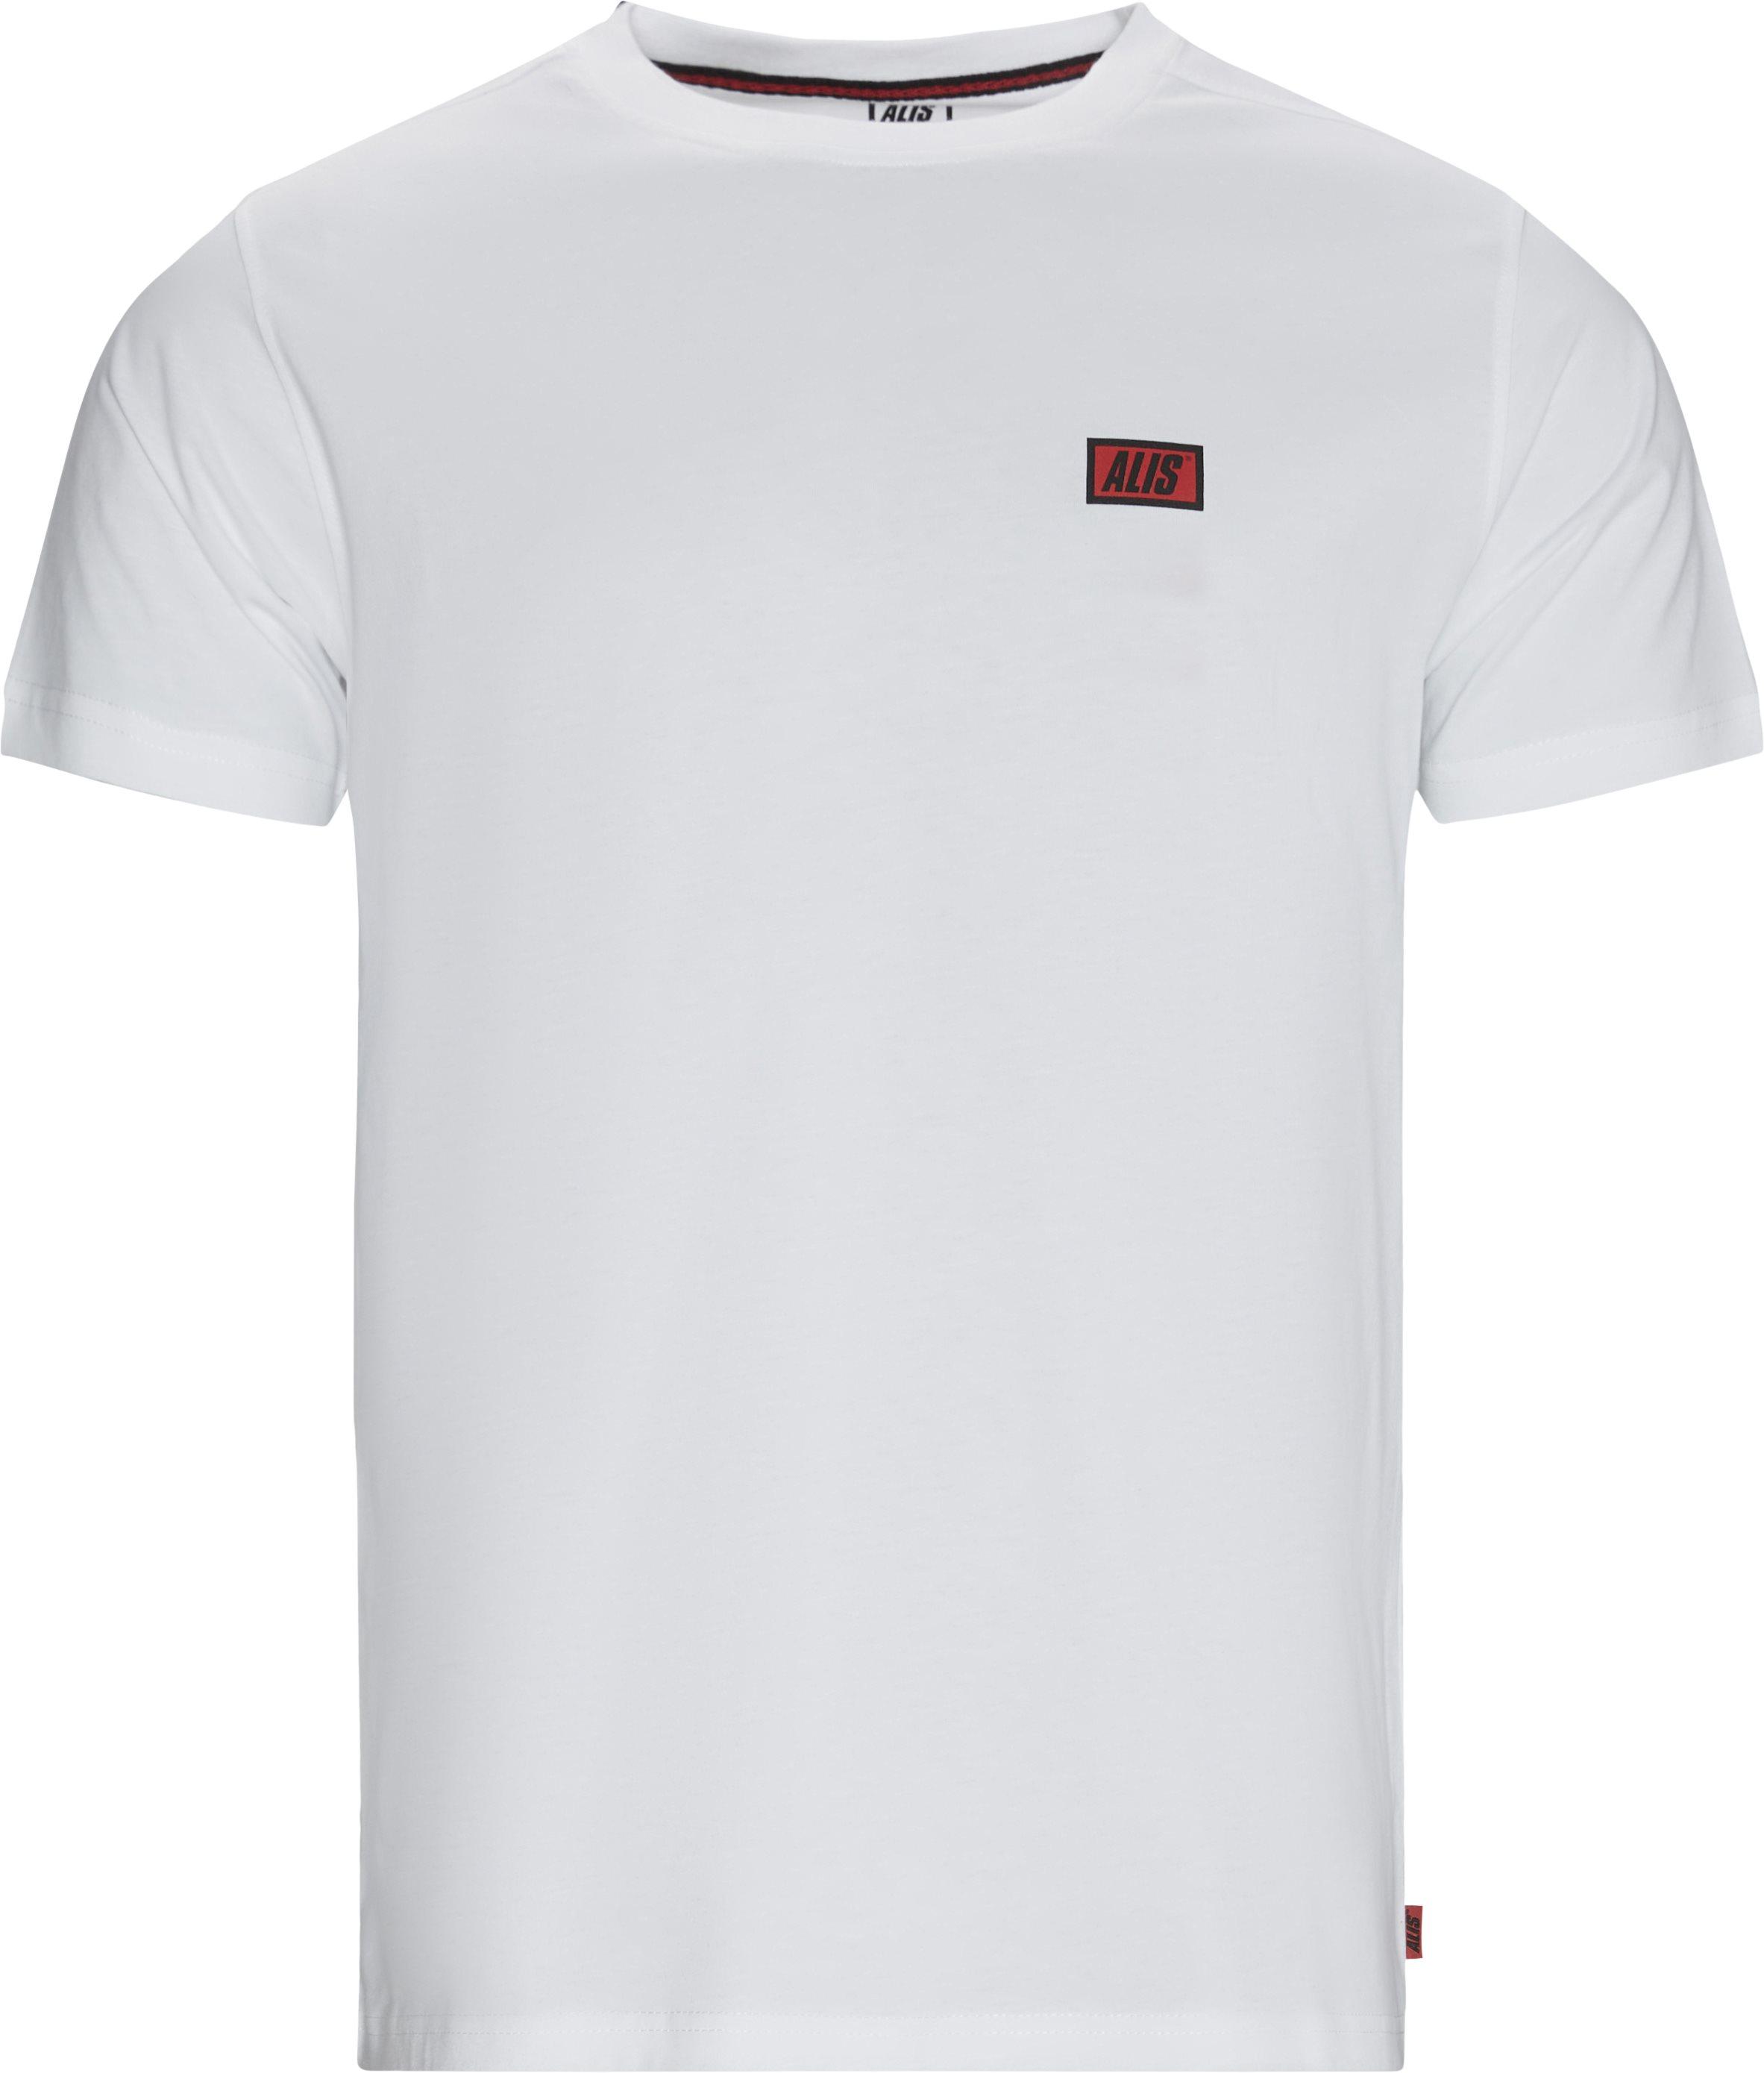 Am3001 Tee - T-shirts - Regular - Vit